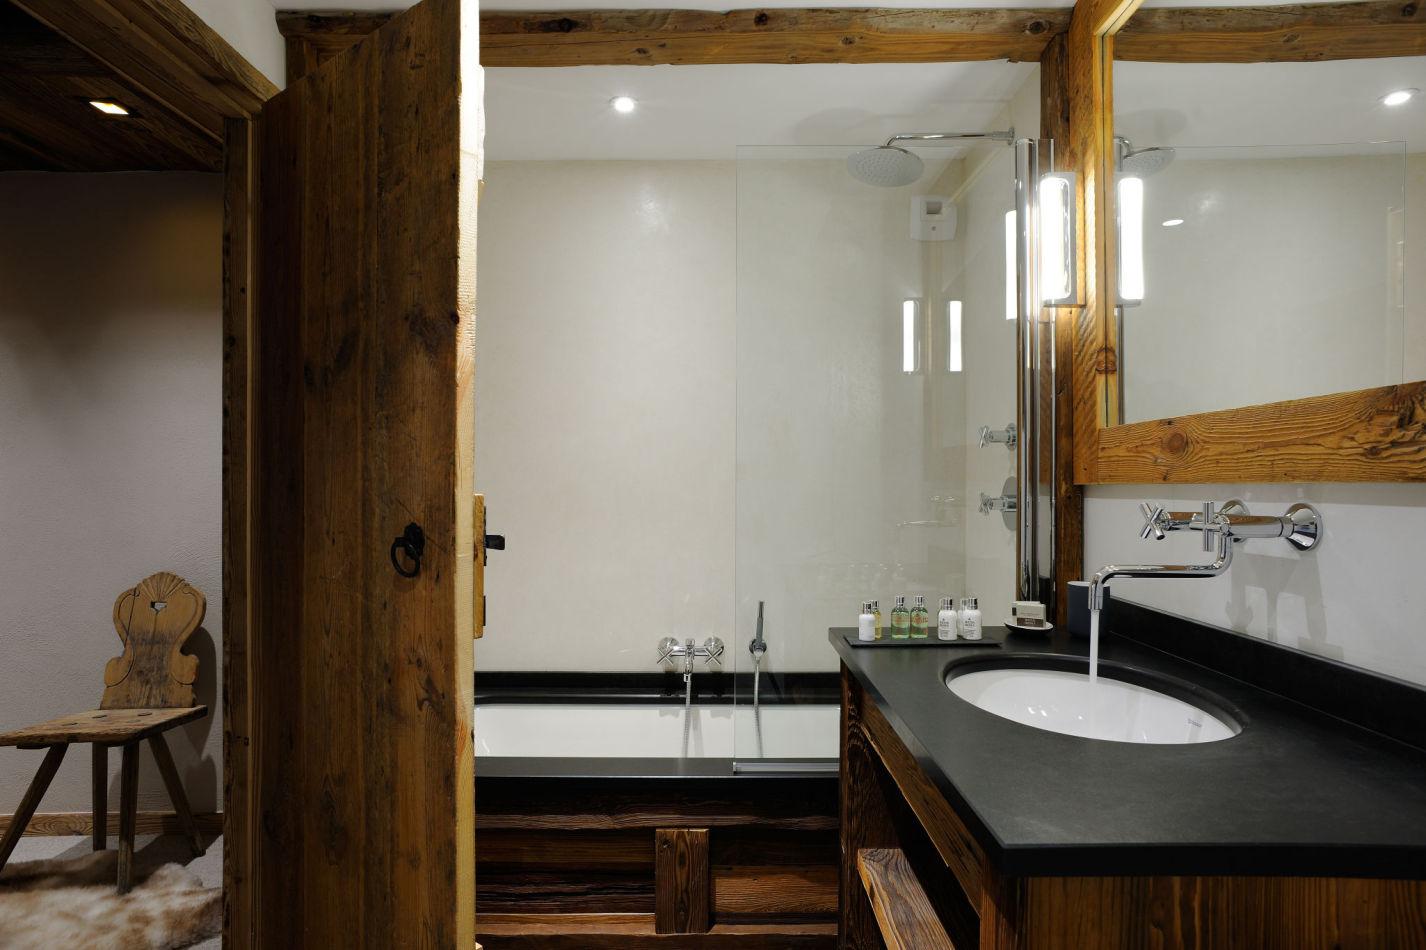 14-en-suite-bathrooms-all-the-same